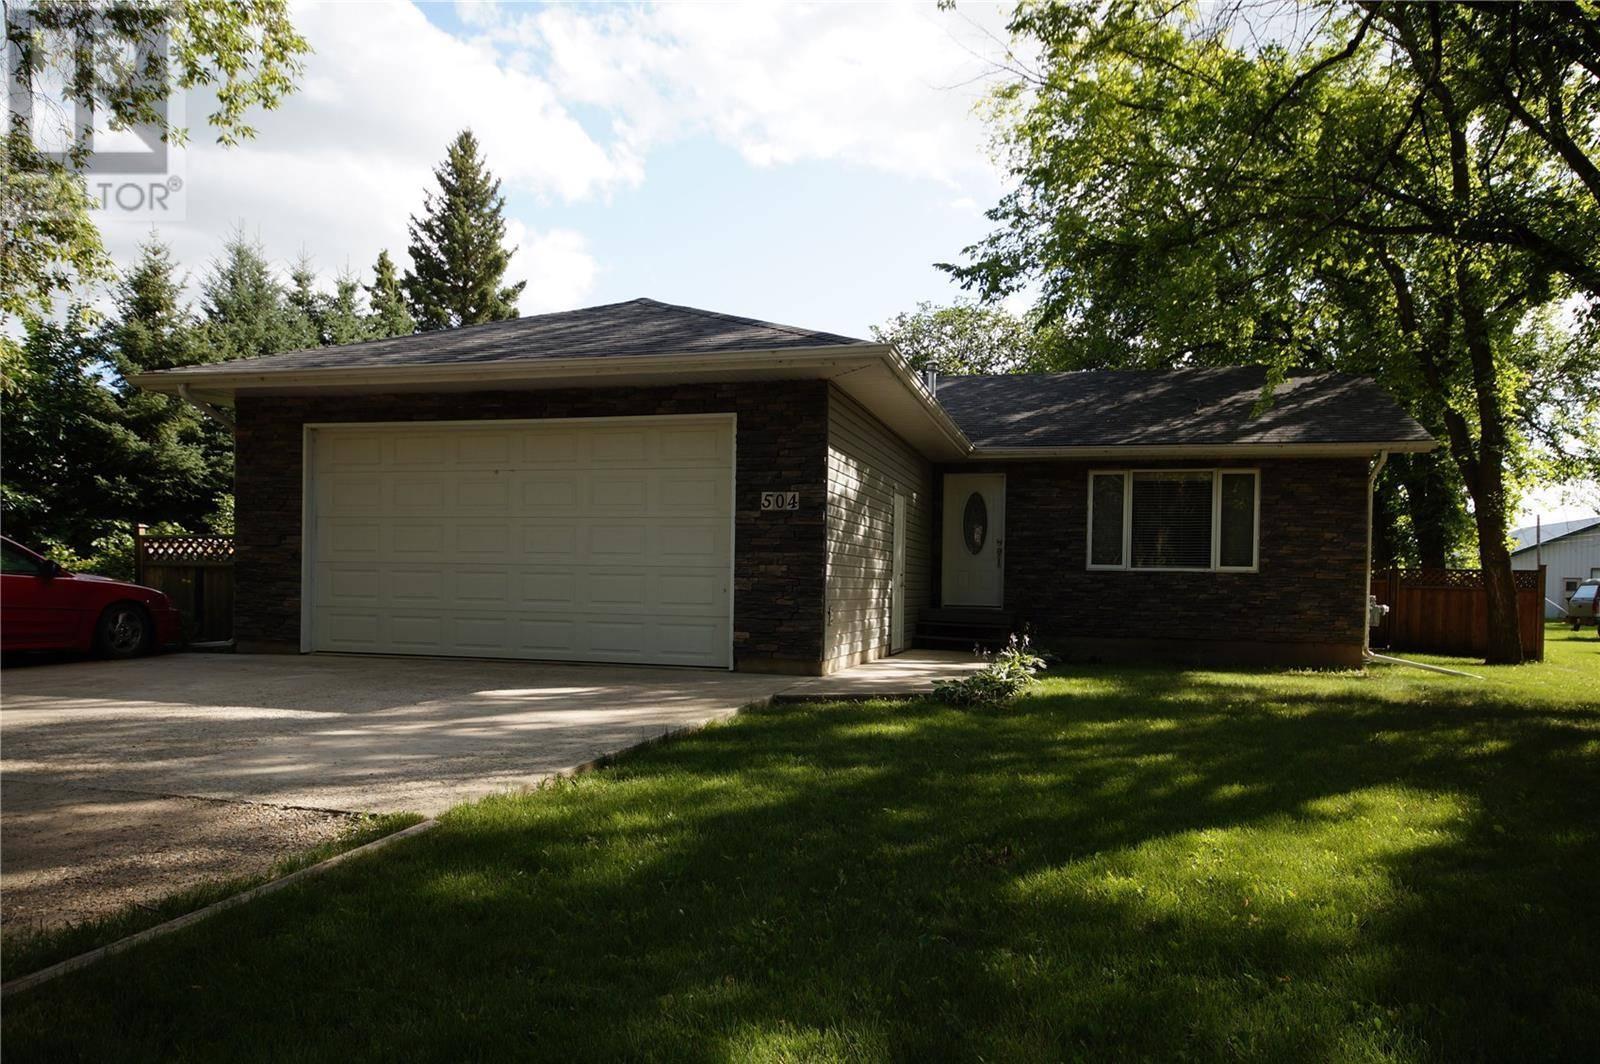 House for sale at 504 1st St S Waldheim Saskatchewan - MLS: SK782915